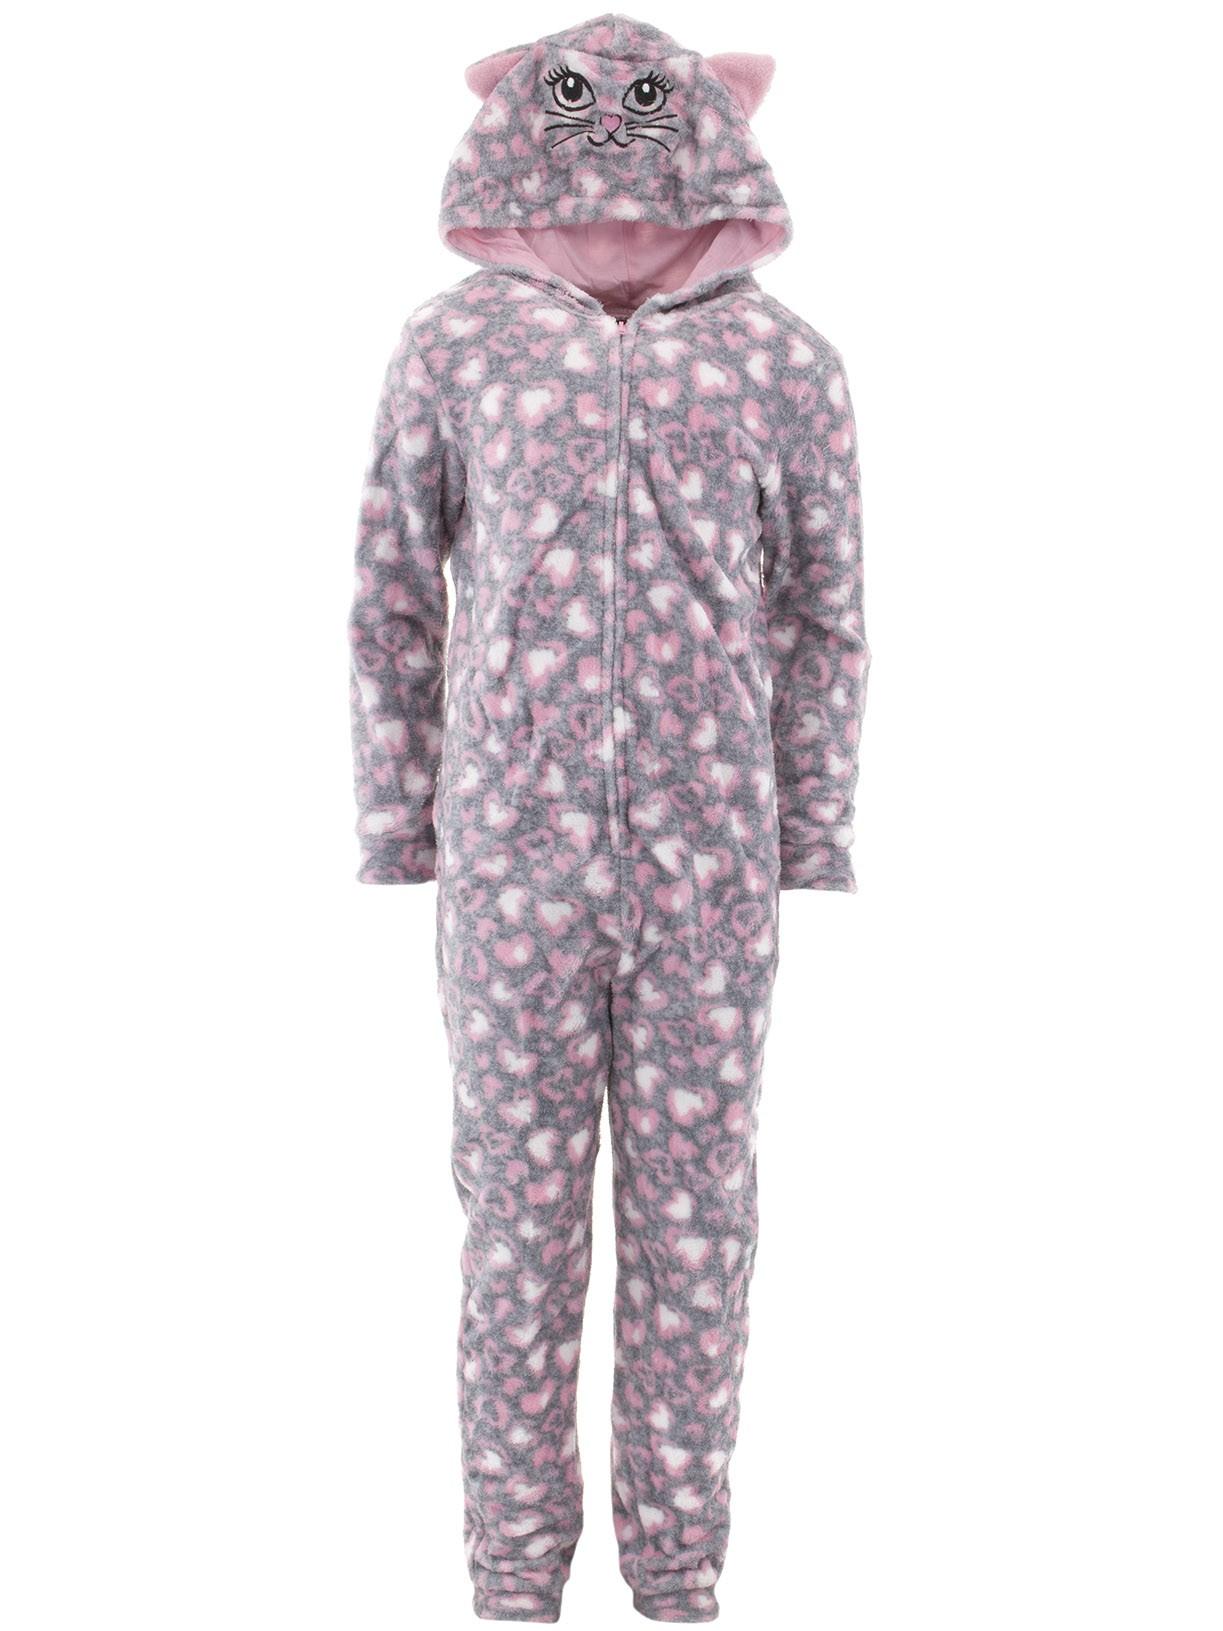 dELiA*s Girls Cat Gray Hooded One-Piece Pajamas